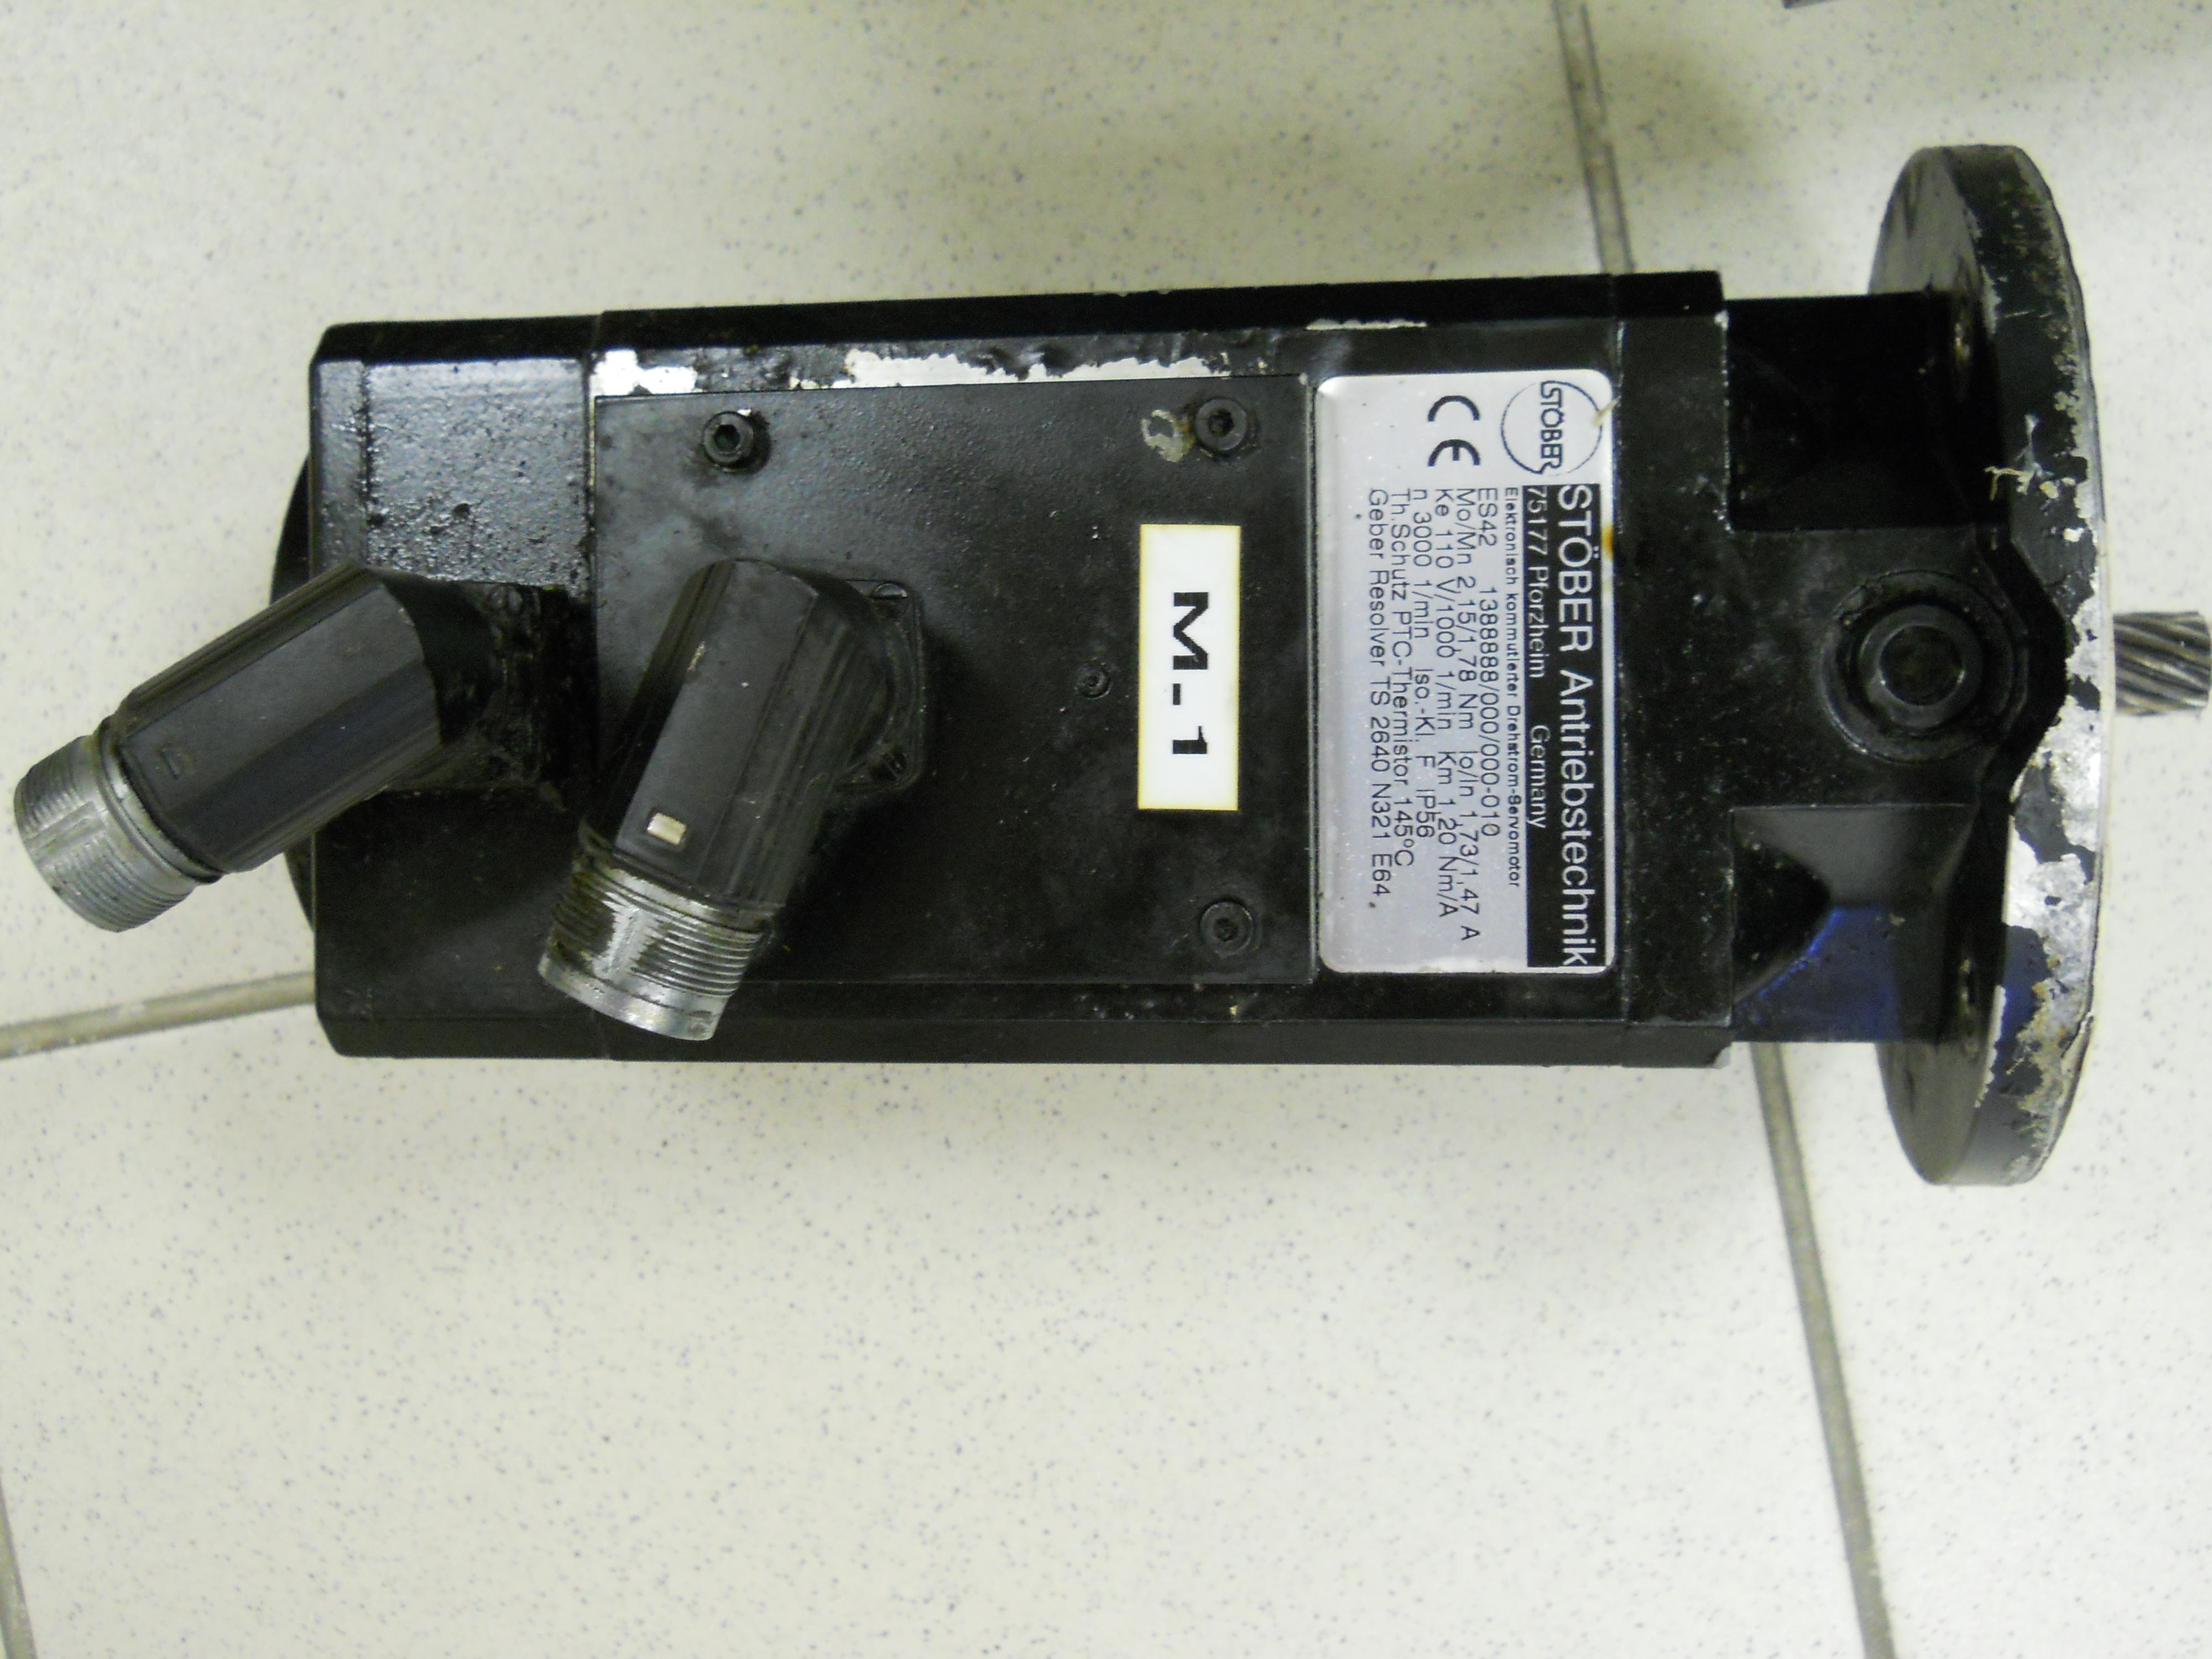 Ремонт STOBER POSIDRIVE POSIDYN SDS MDS FDS 5000 FAS 4000 сервопривод привод серводвигатель